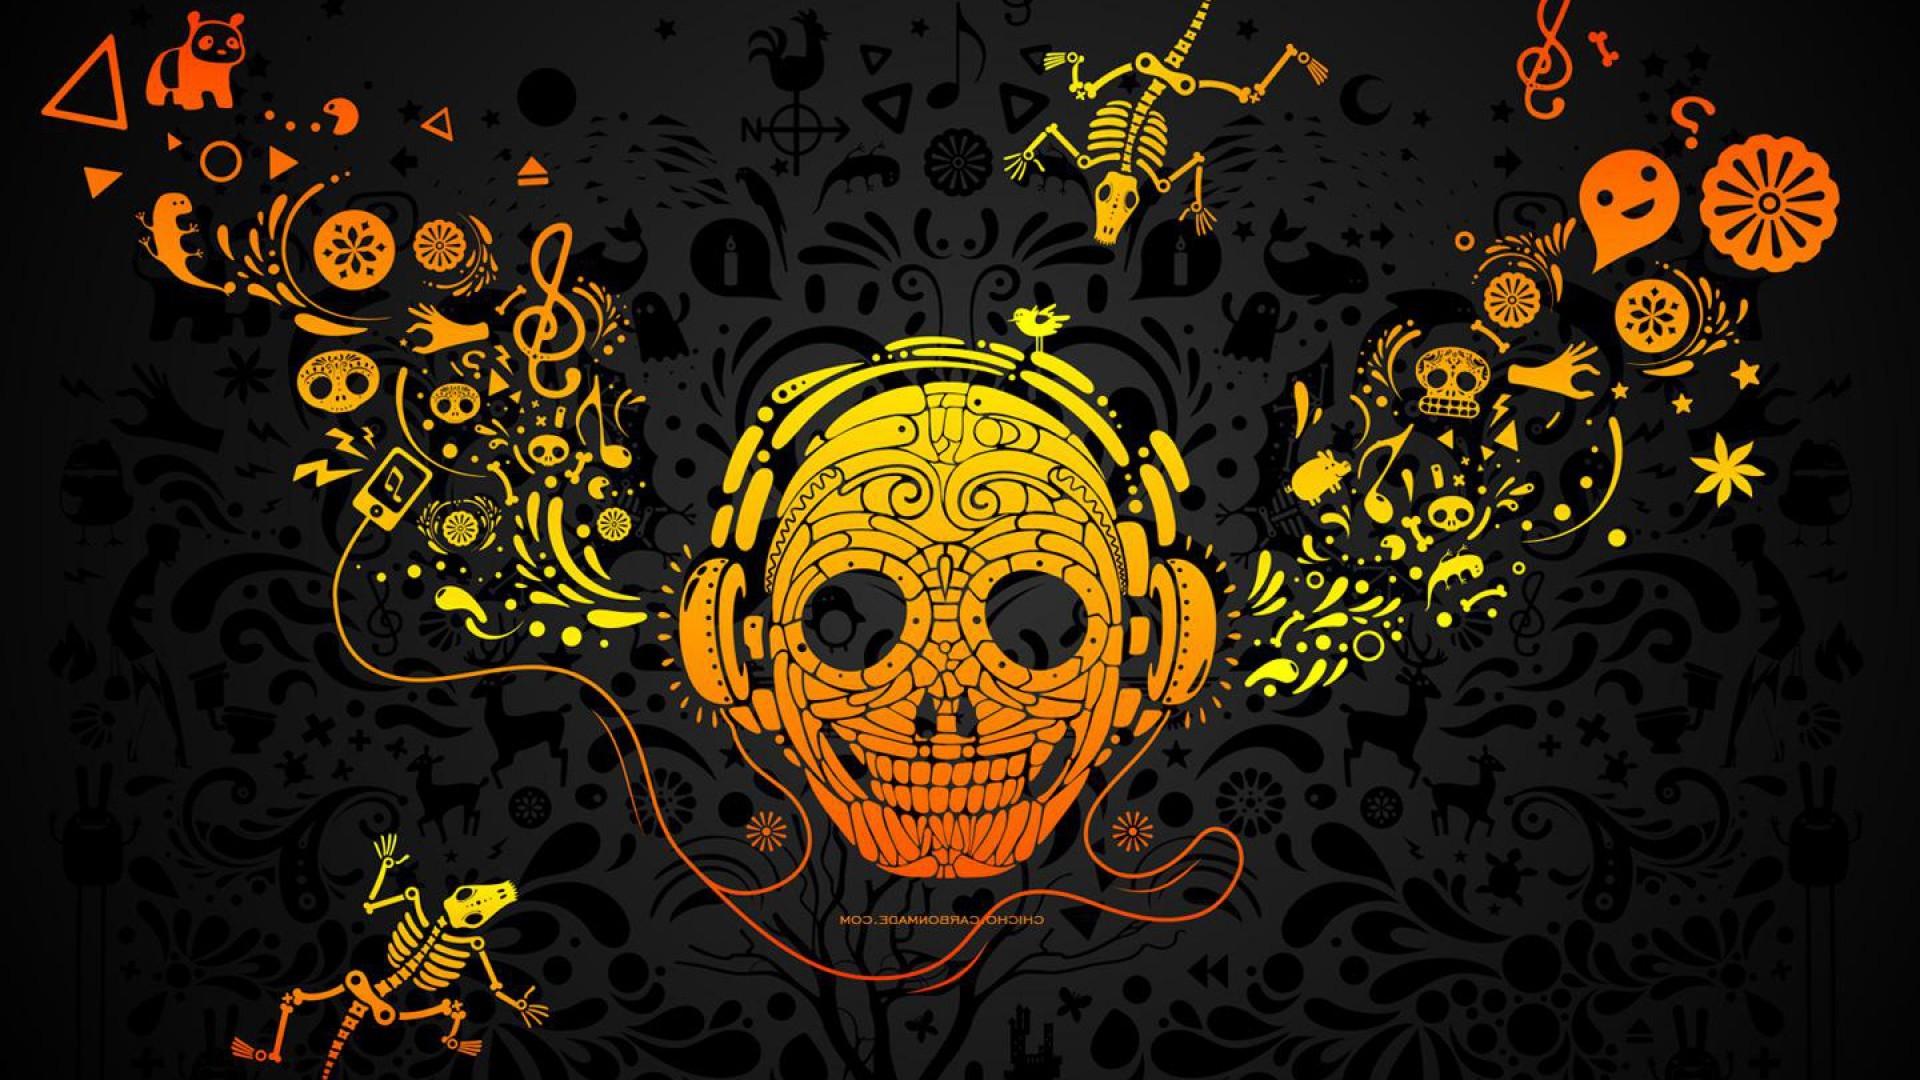 Trippy Wallpapers Hd: Crazy Desktop Backgrounds ·① WallpaperTag